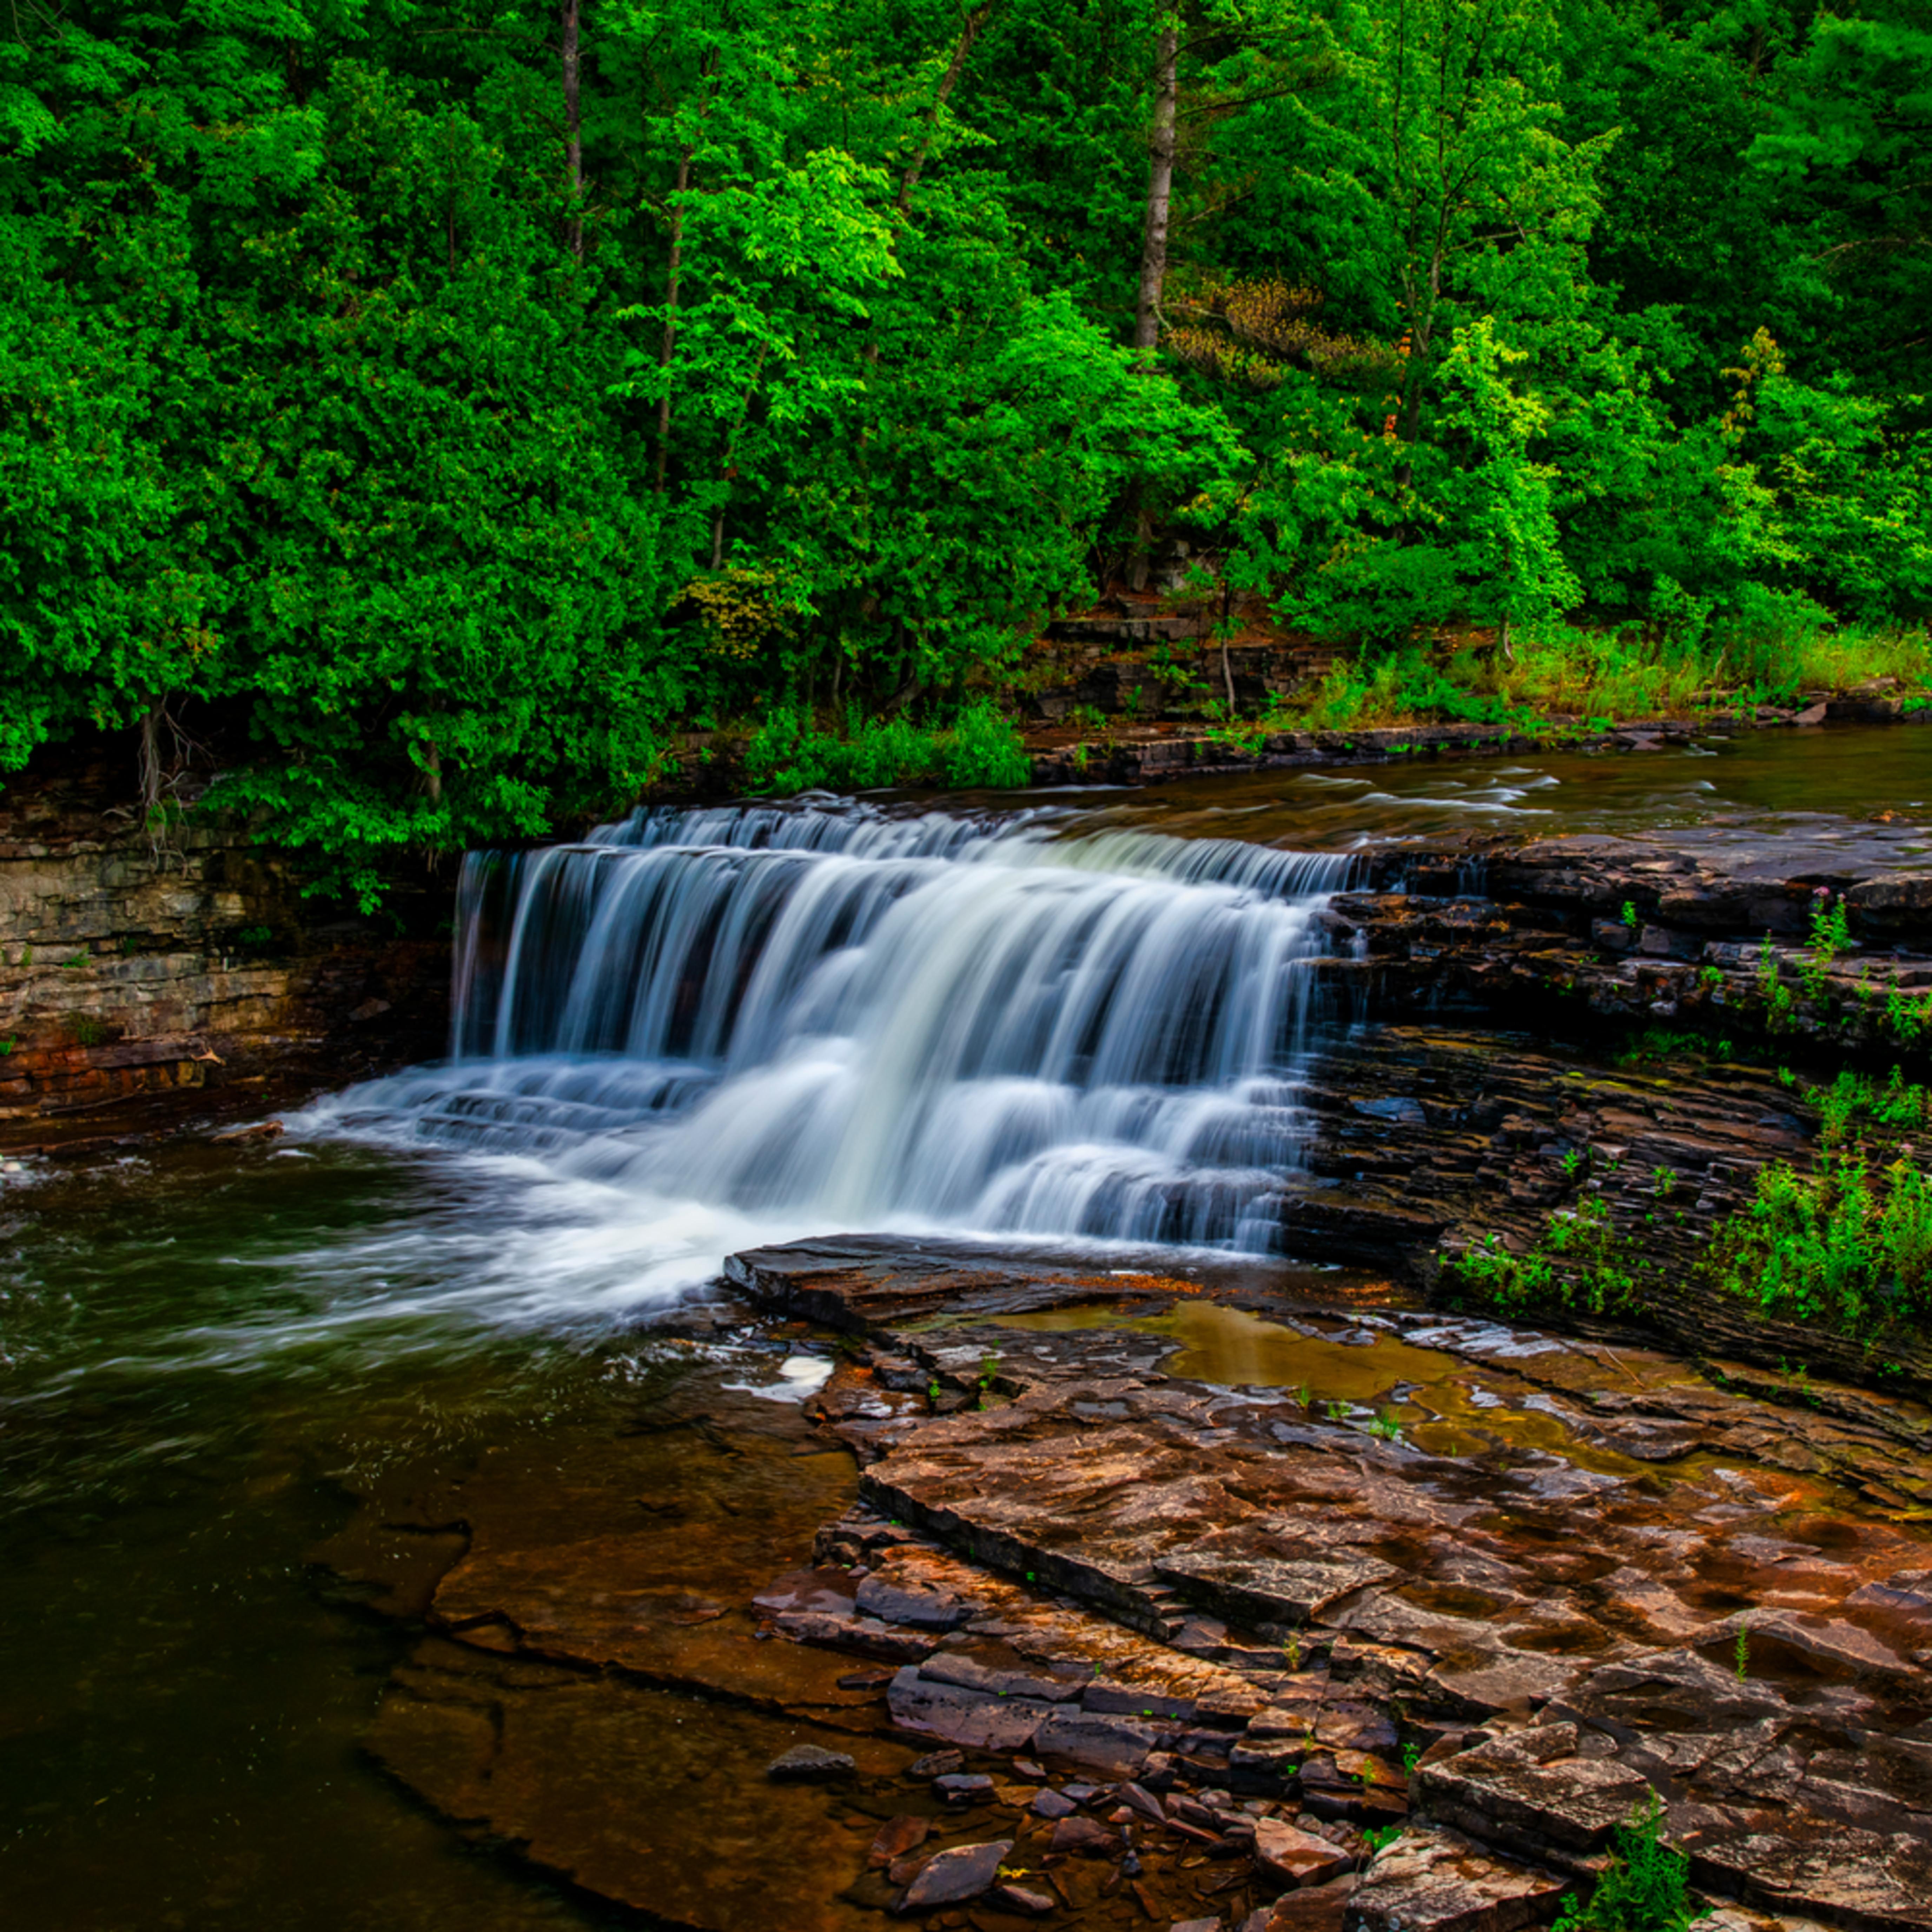 Andy crawford photography woods falls v8kkvp